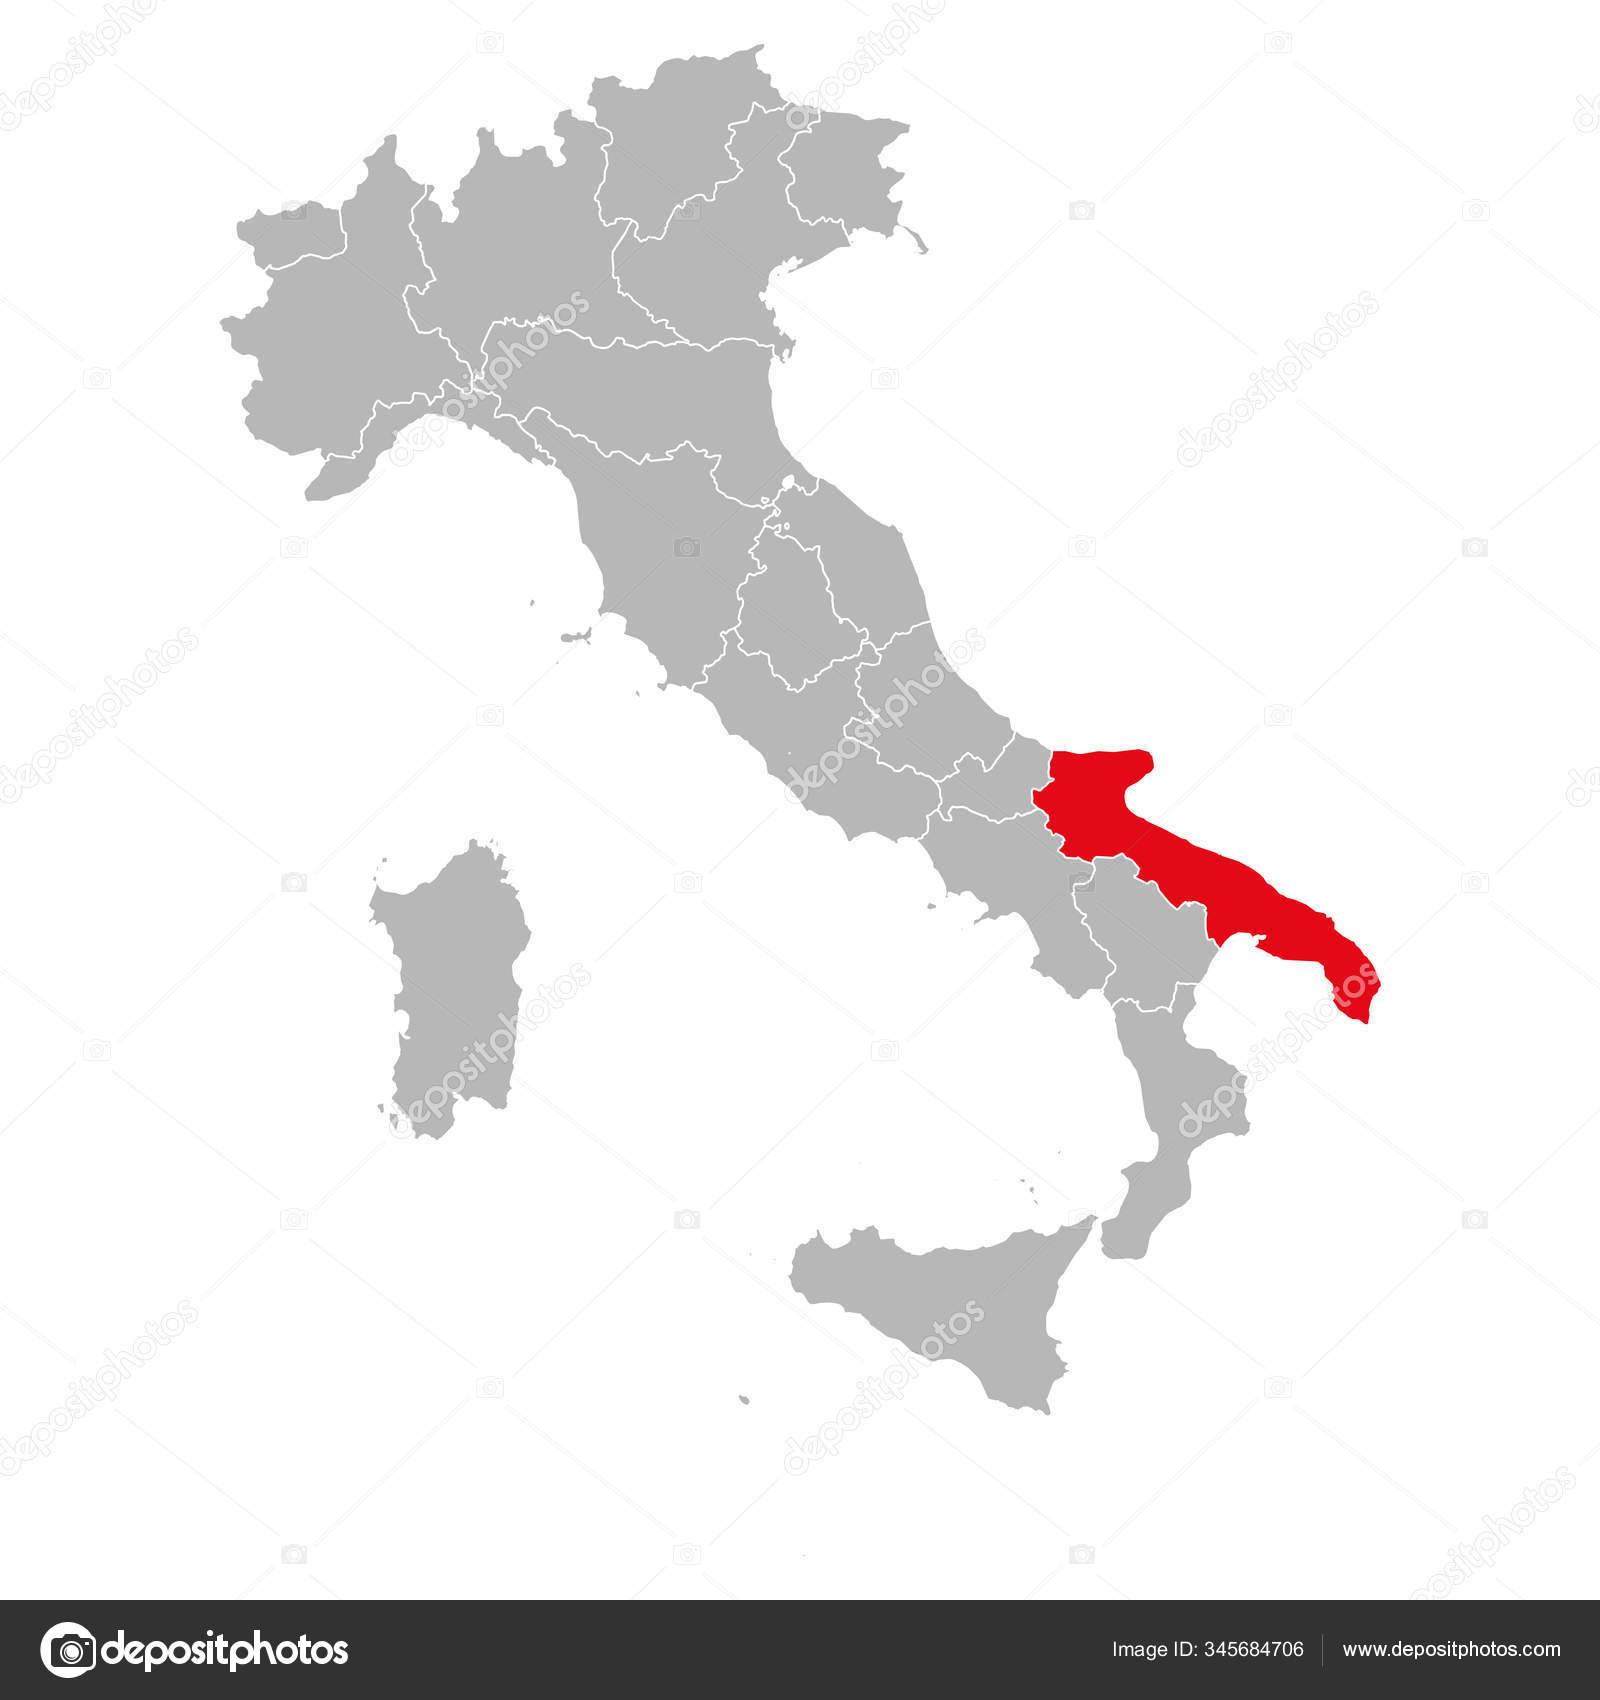 Cartina Italia Puglia.Immagine Vettoriale Mappa Puglia Illustrazioni Vettoriali Mappa Puglia Depositphotos